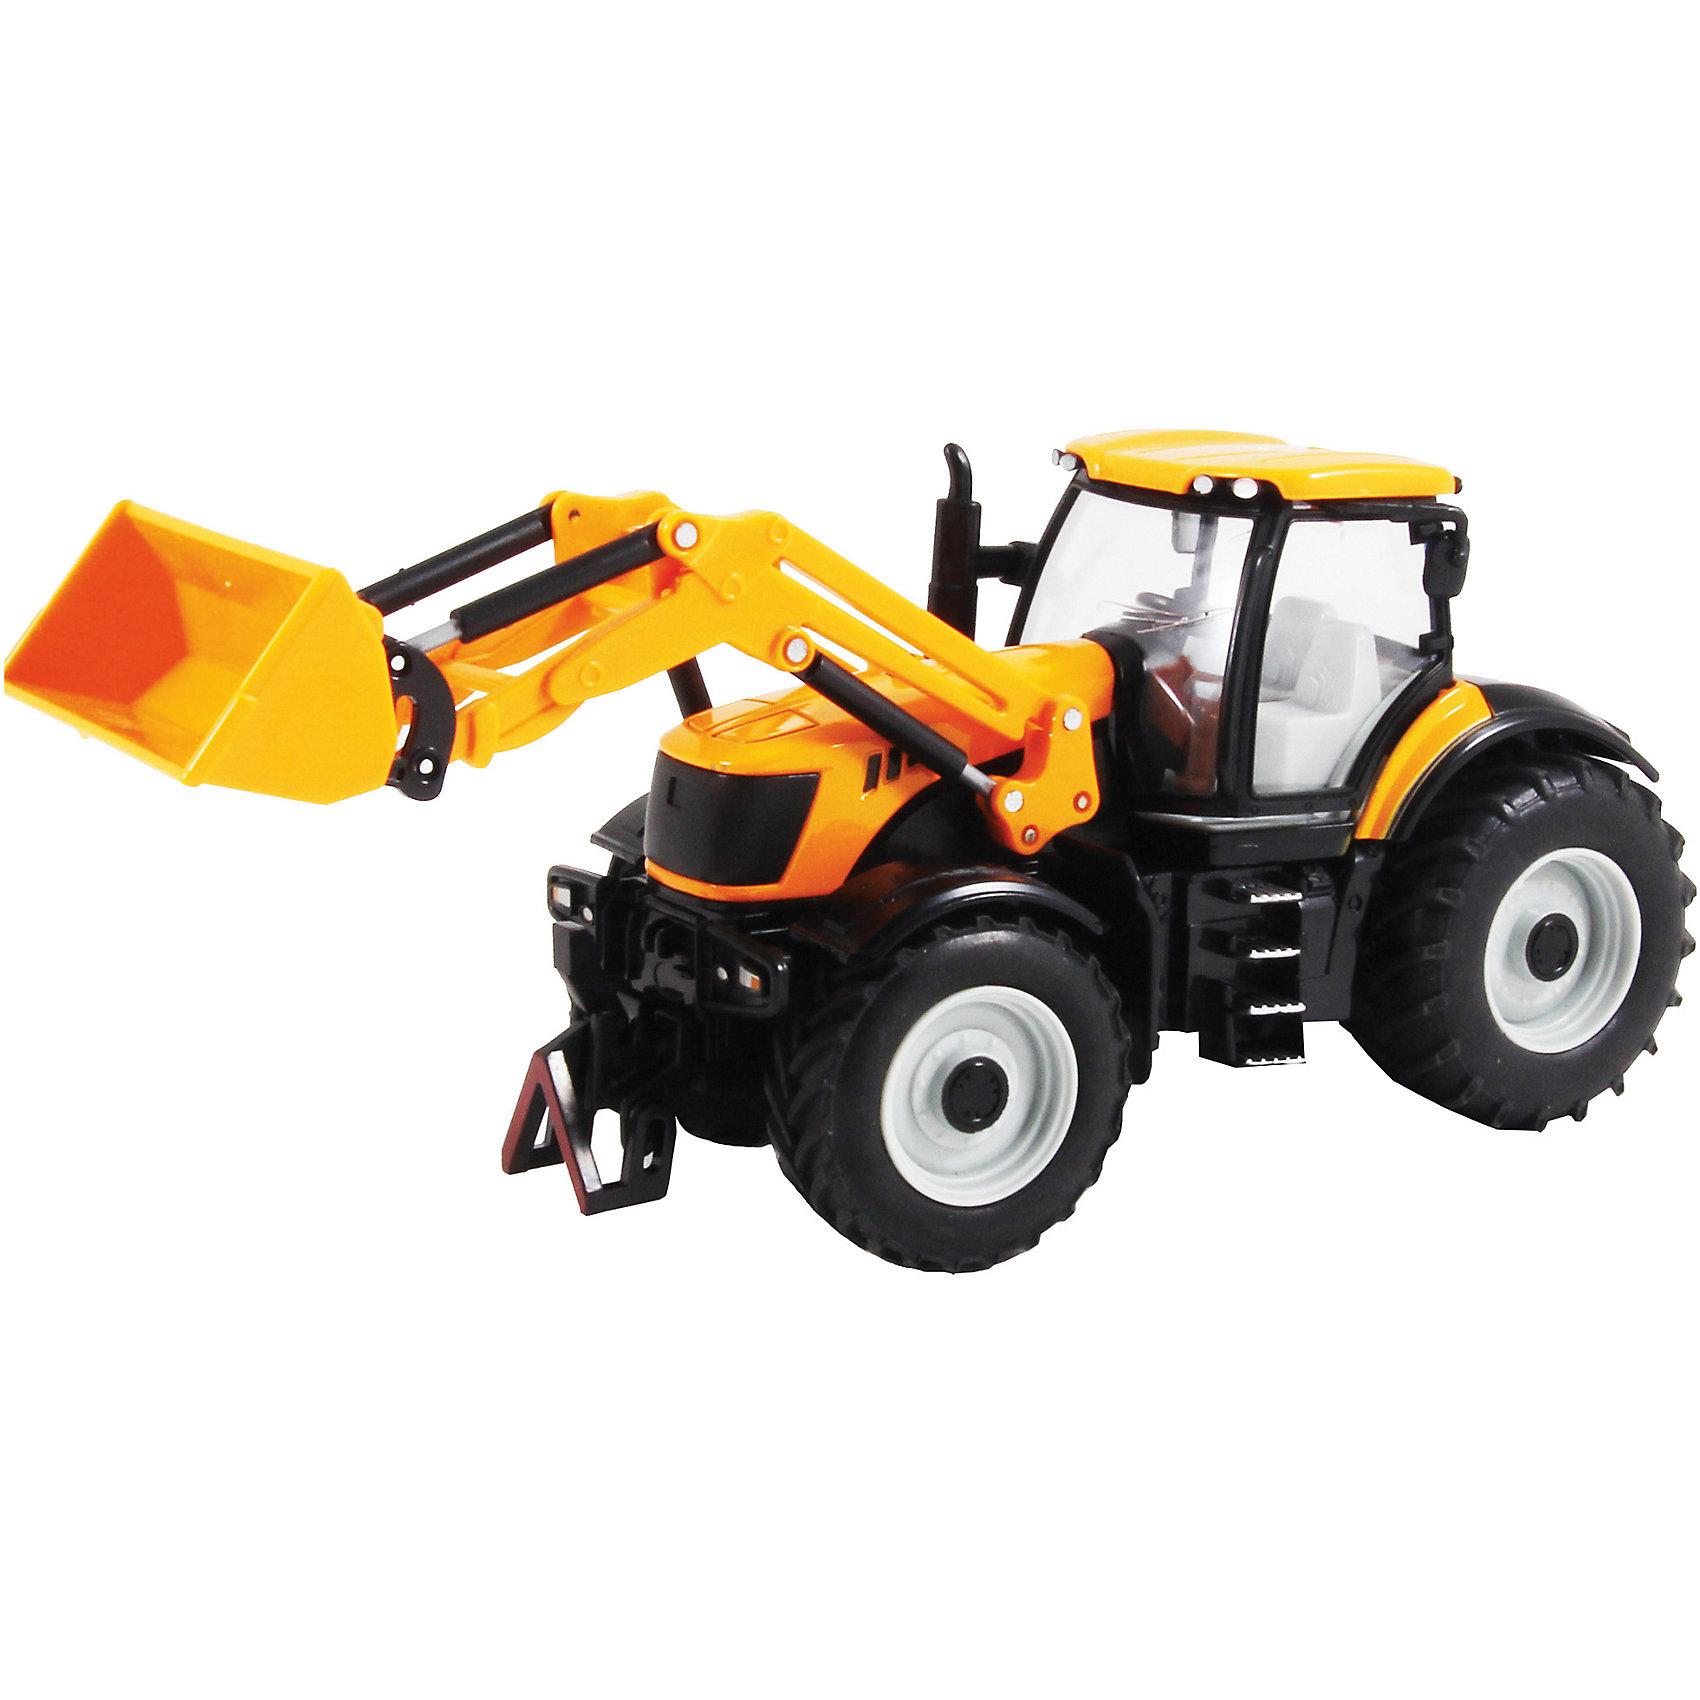 Трактор MC135, 1:30, в ассортименте,  KRUTTI